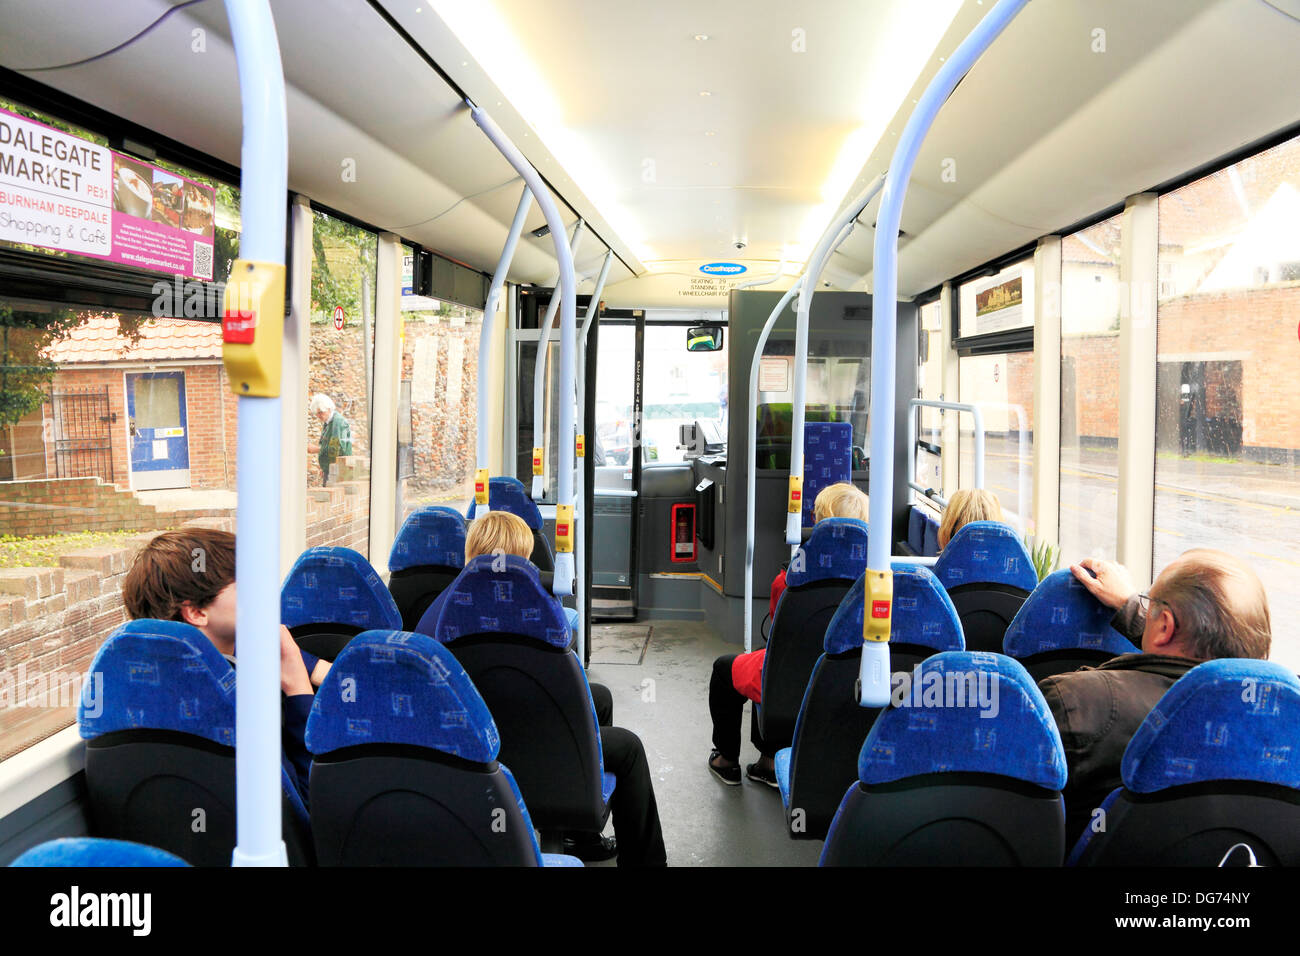 Coast Hopper Bus and passengers, interior, Norfolk England UK public transport service, Coasthopper - Stock Image